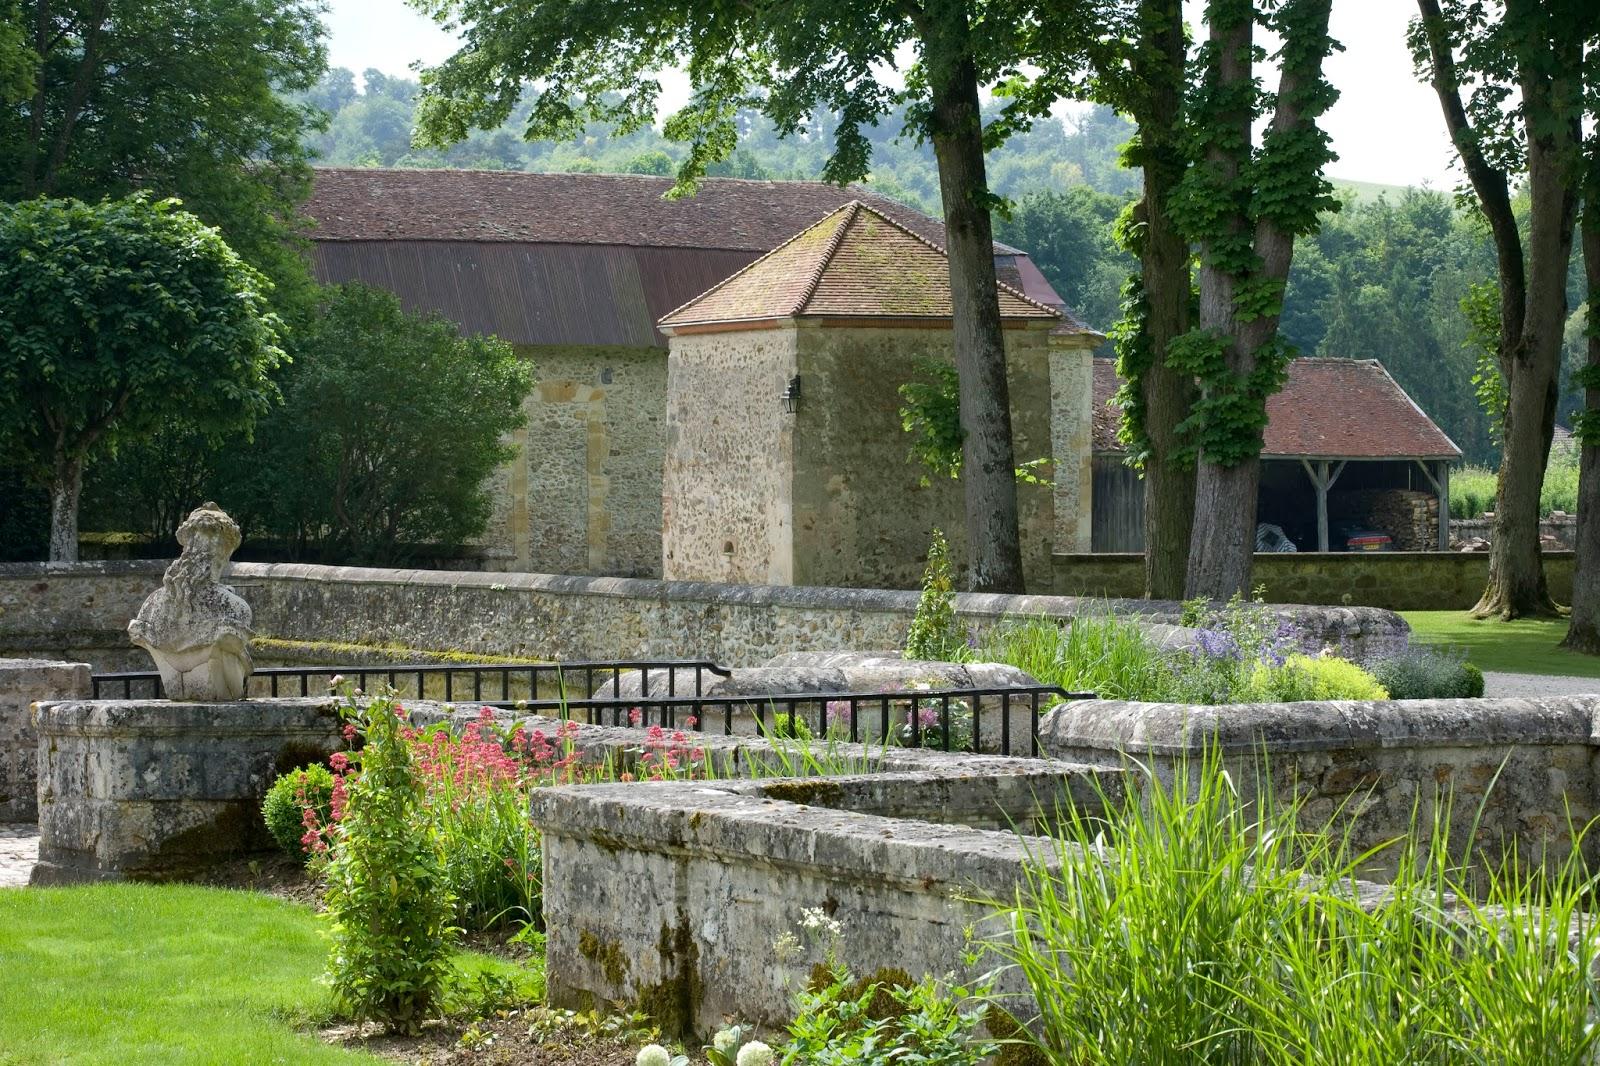 Wine in style laurent perrier et les jardins ou for Louis jardin wine